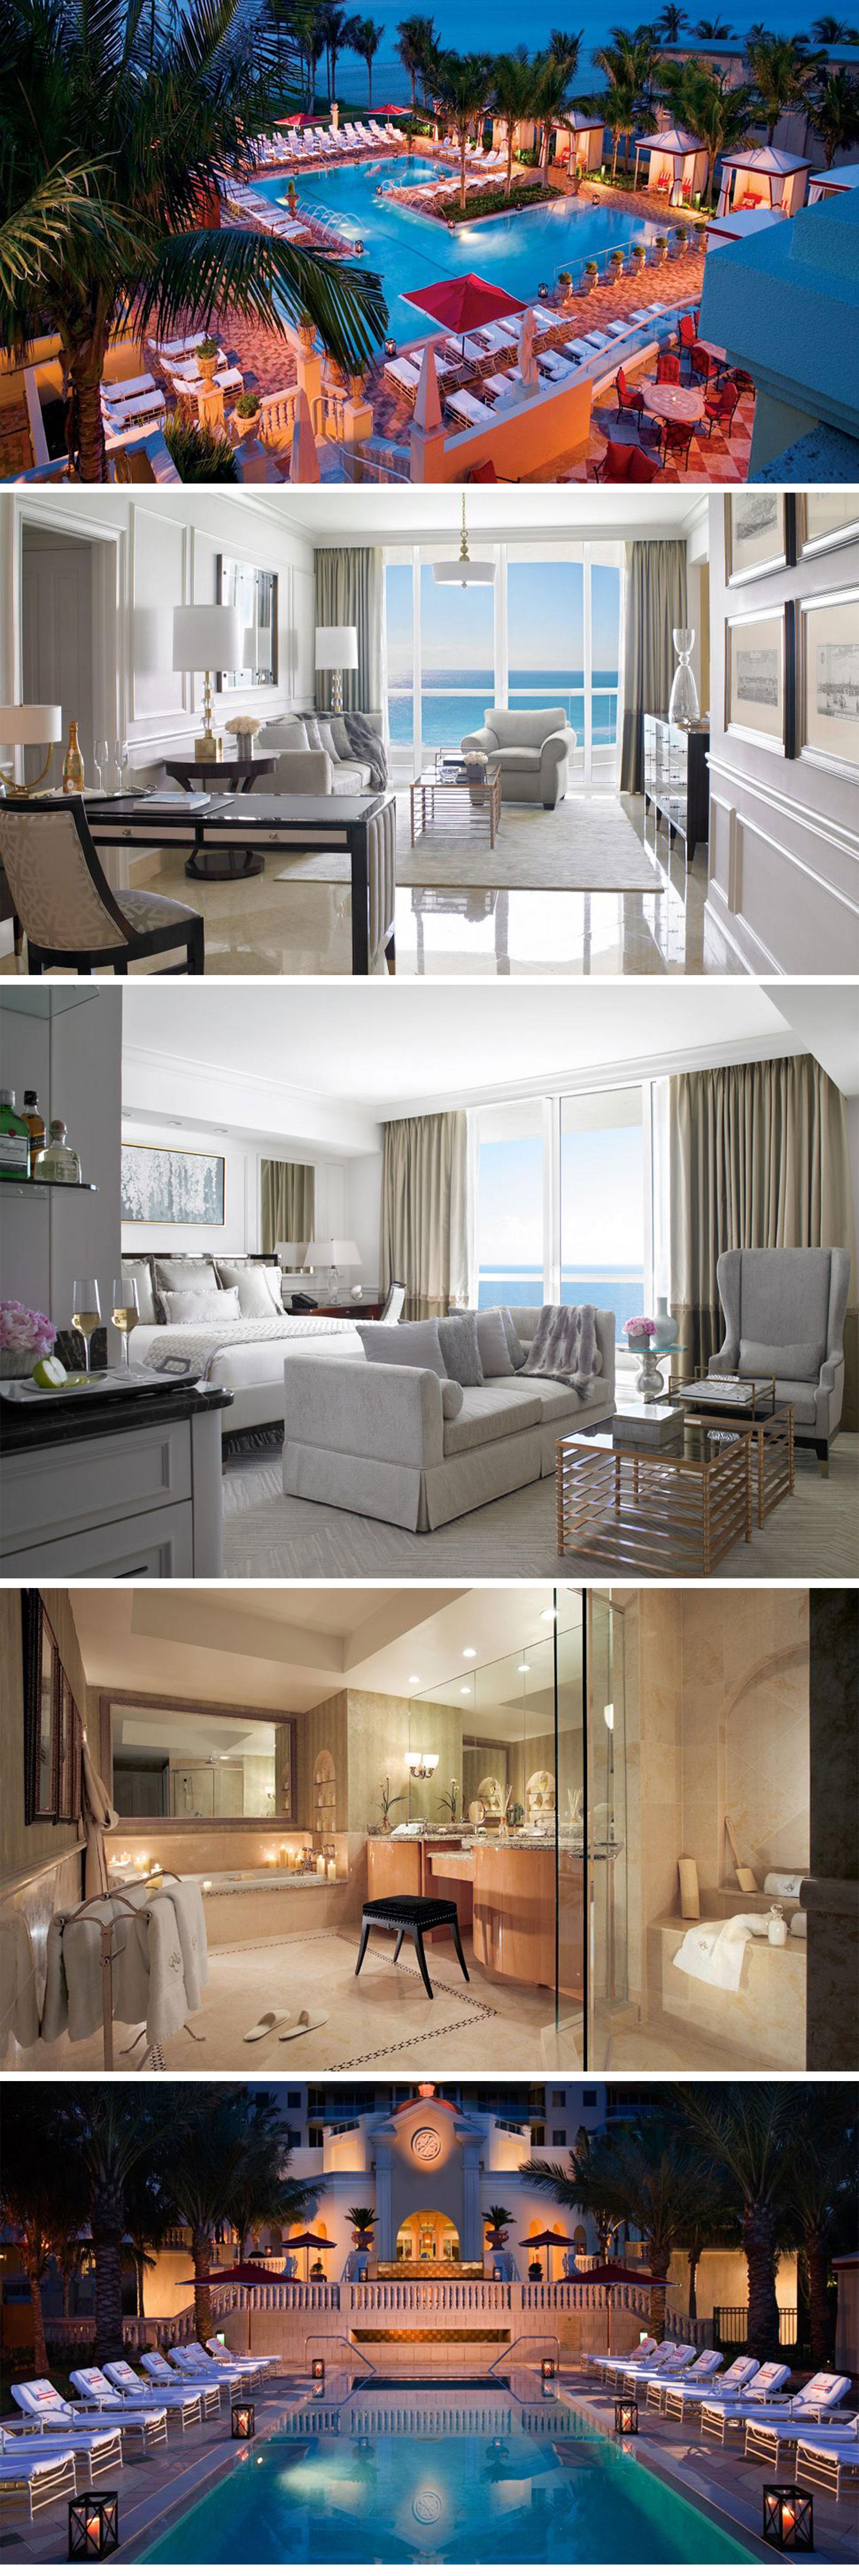 Acqualina Resort & Spa, Sunny Isles Beach, Florida